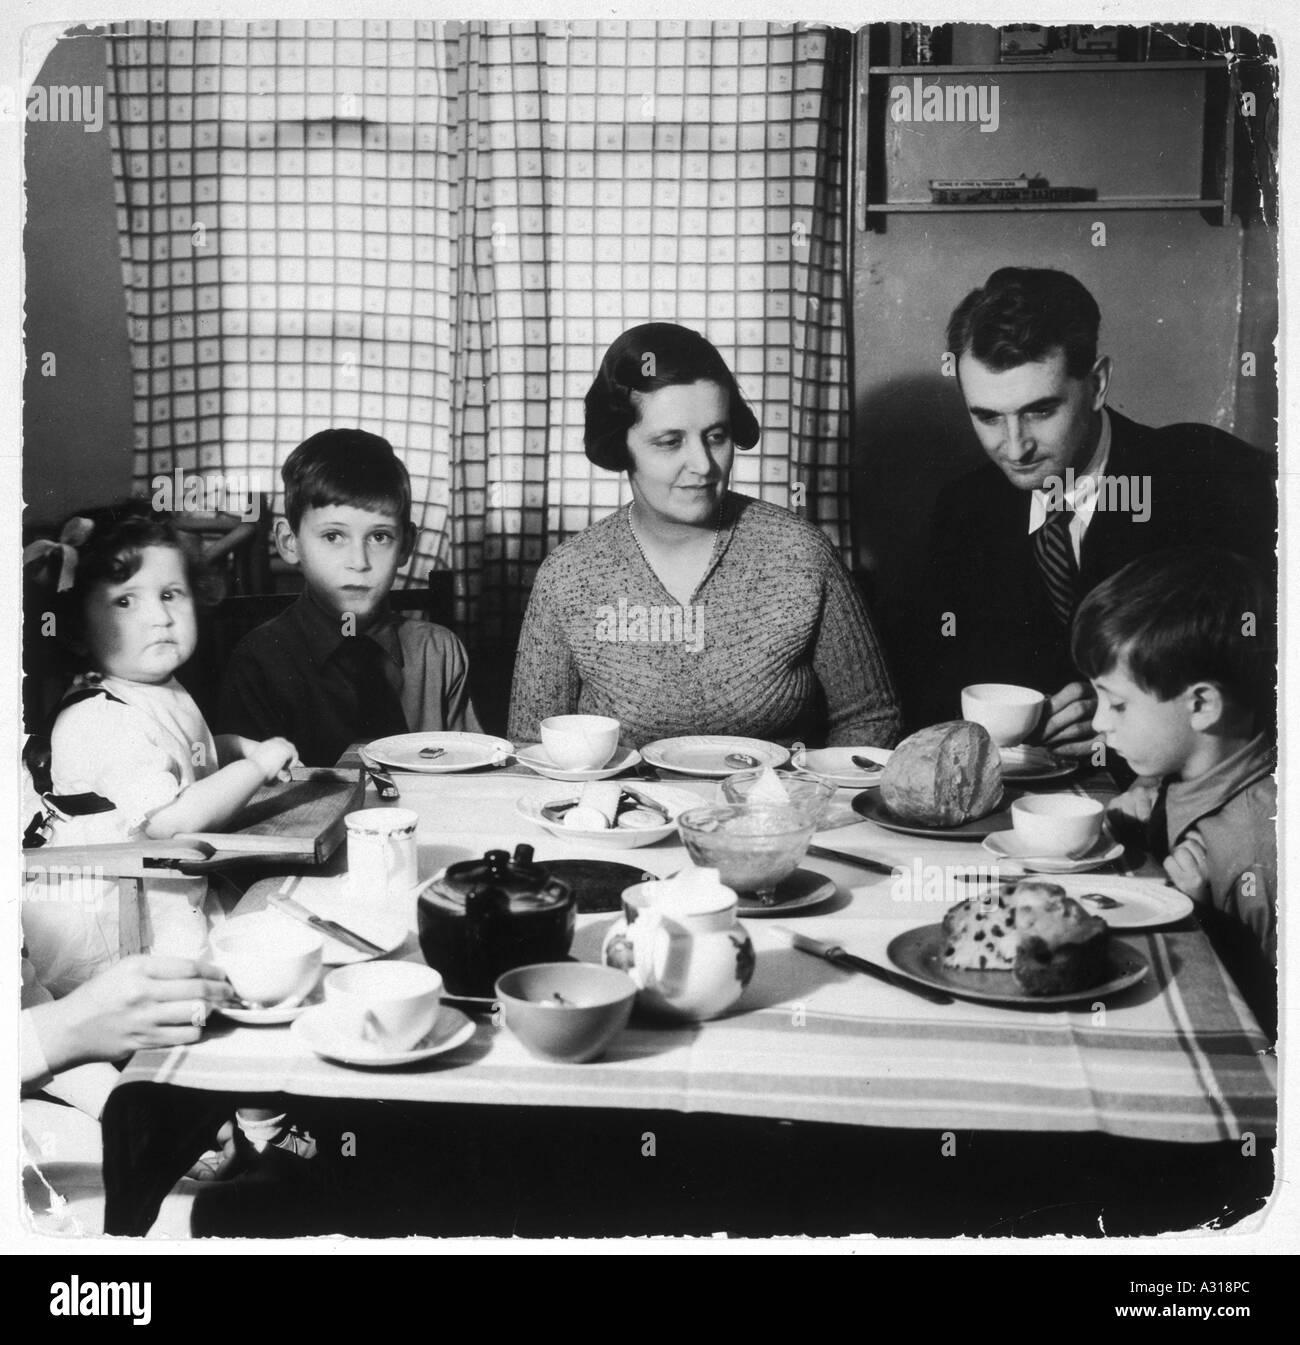 El té de la tarde de la familia 30s Imagen De Stock